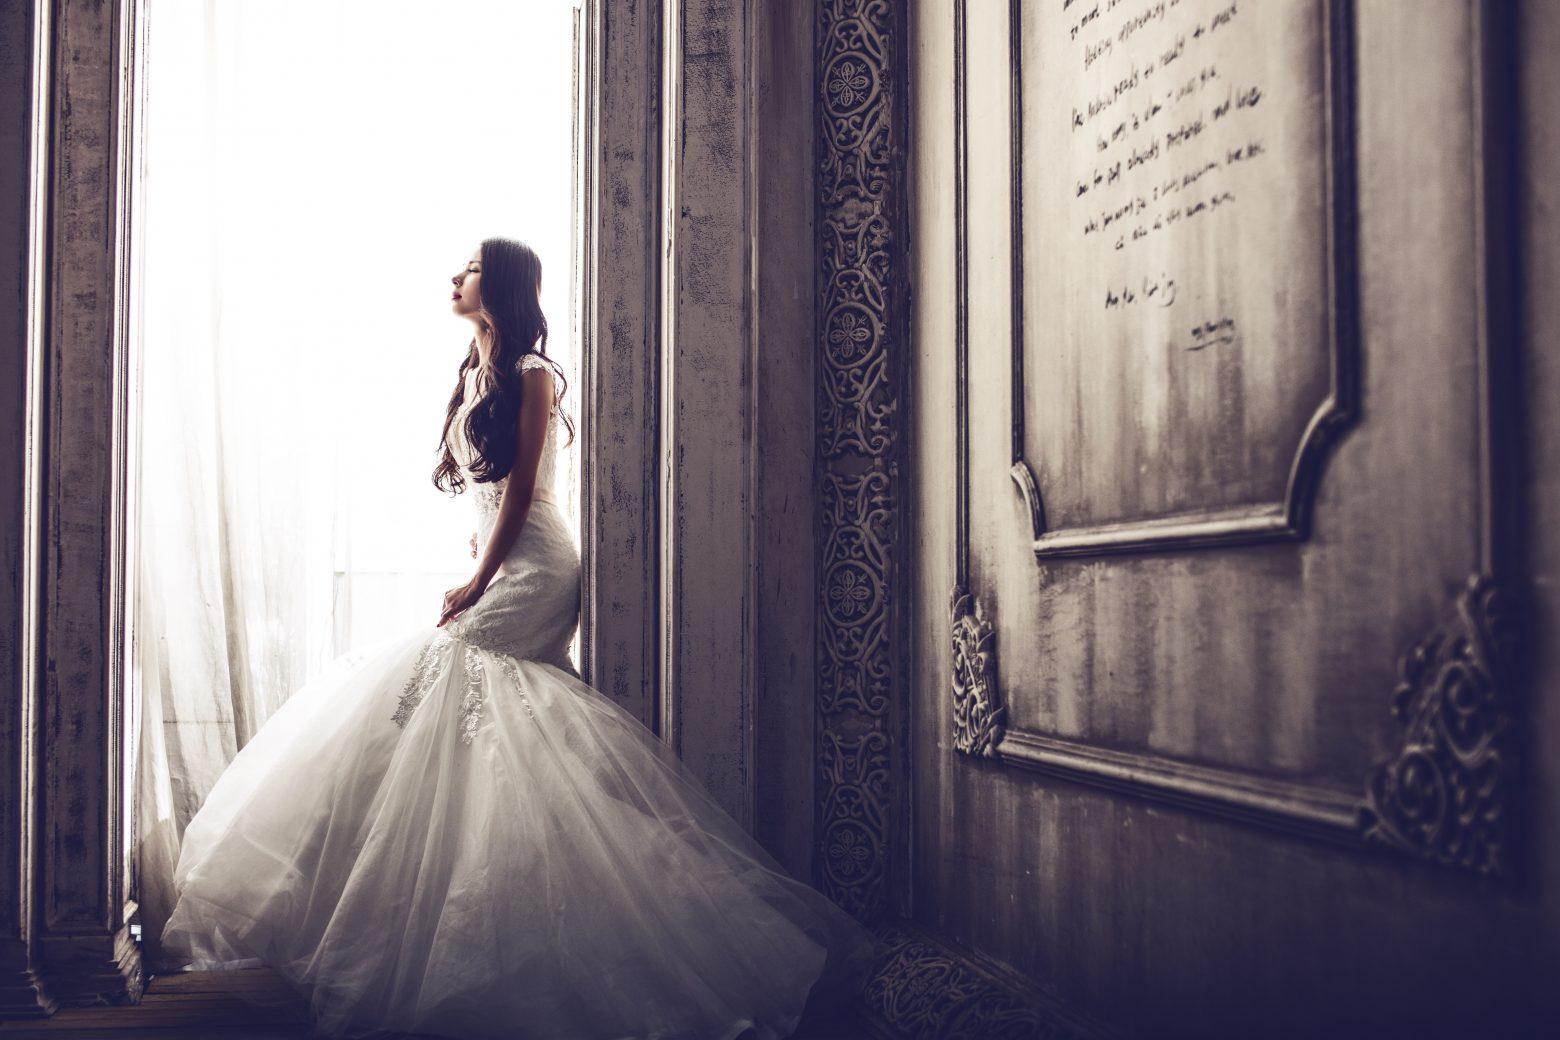 wedding-dresses-1486005